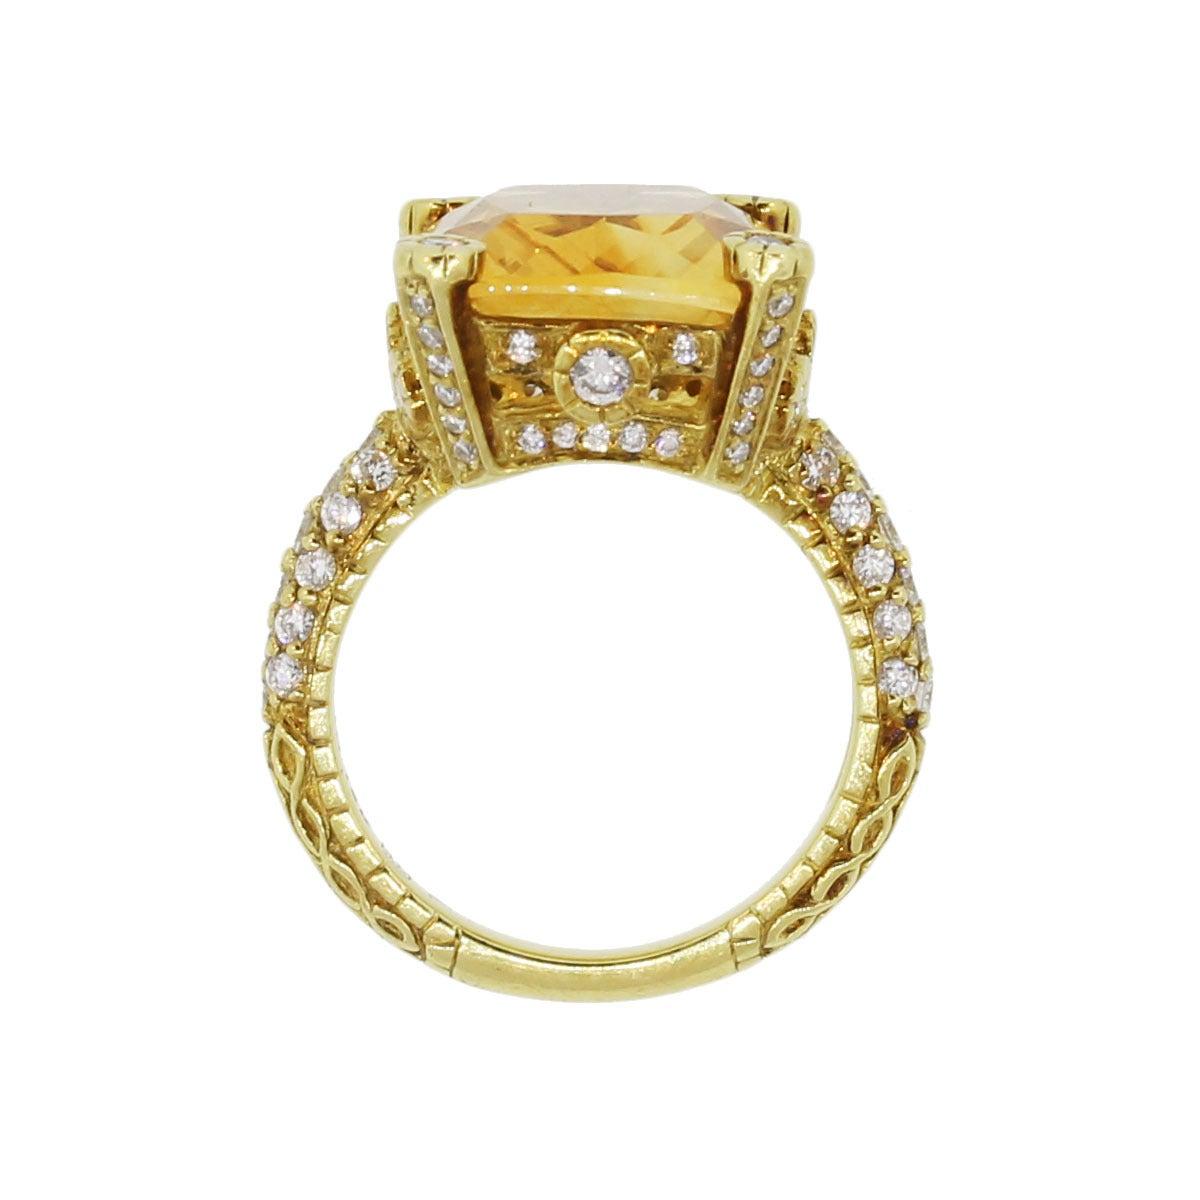 Judith Ripka Madeira Citrine Diamond Gold Ring 5